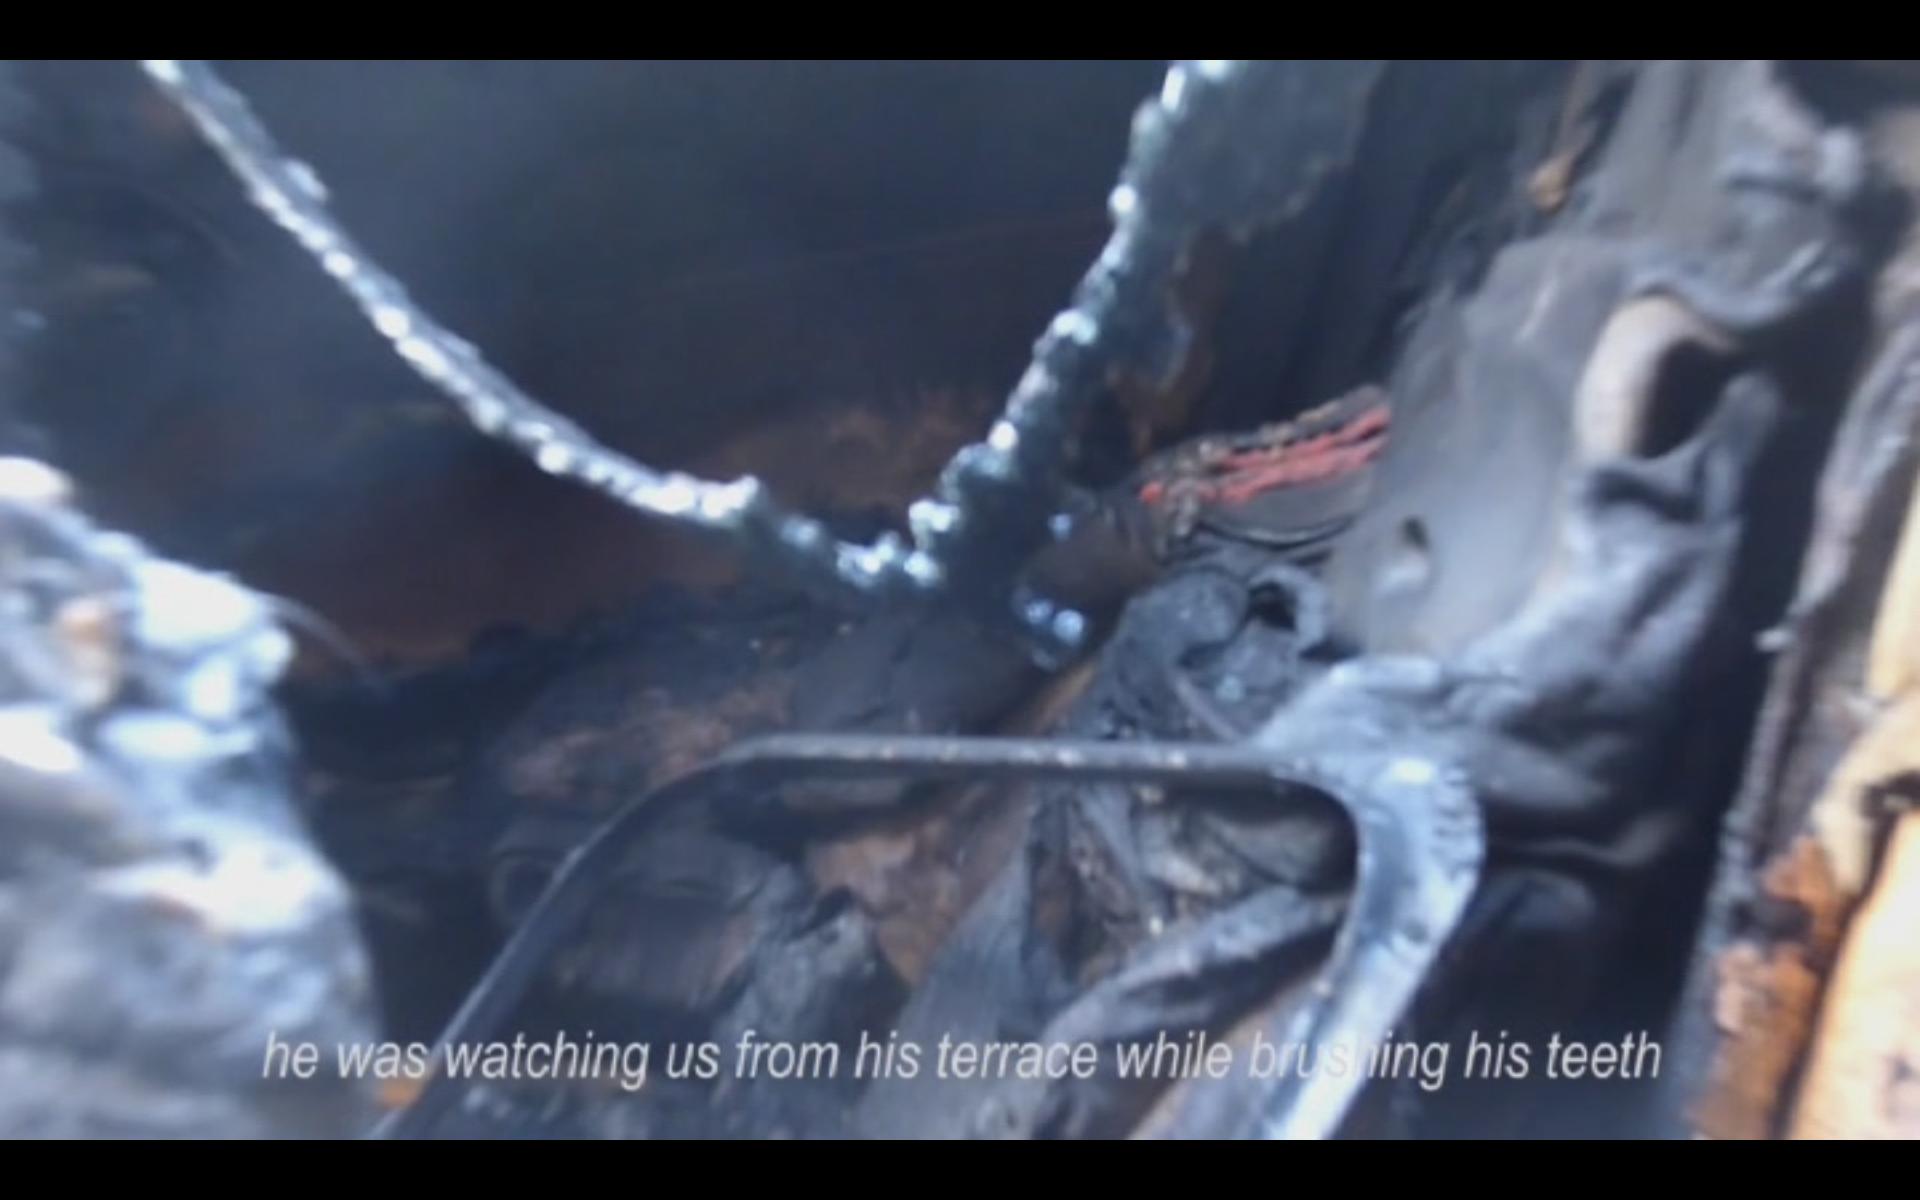 Anna Bąk, Phantom vibrations, hd video, 2014